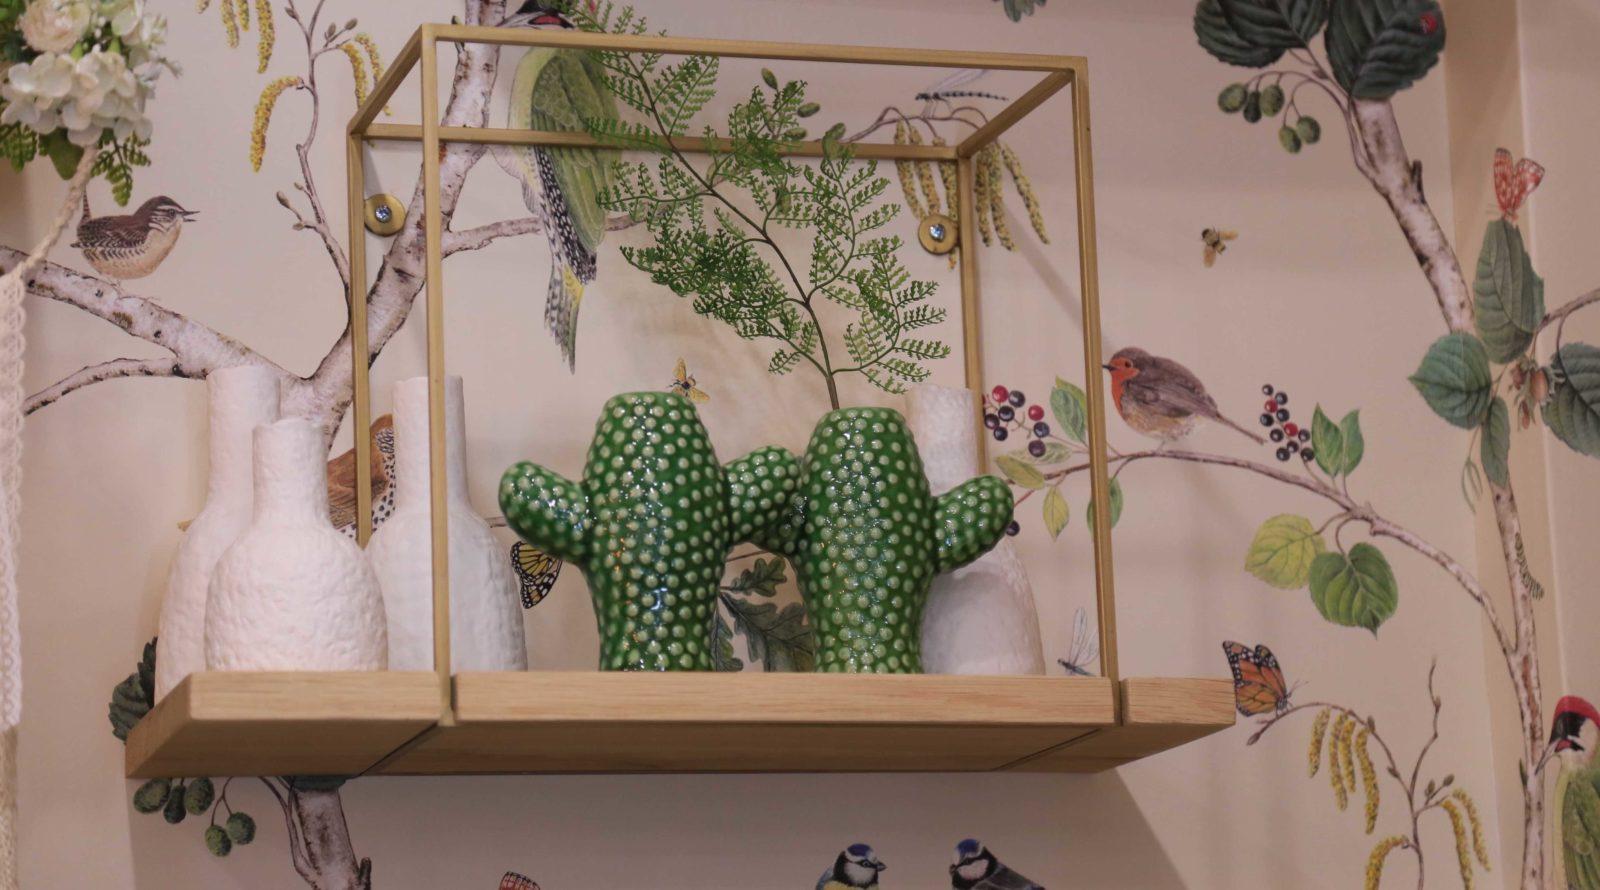 Chamonix Sabine Masson vases